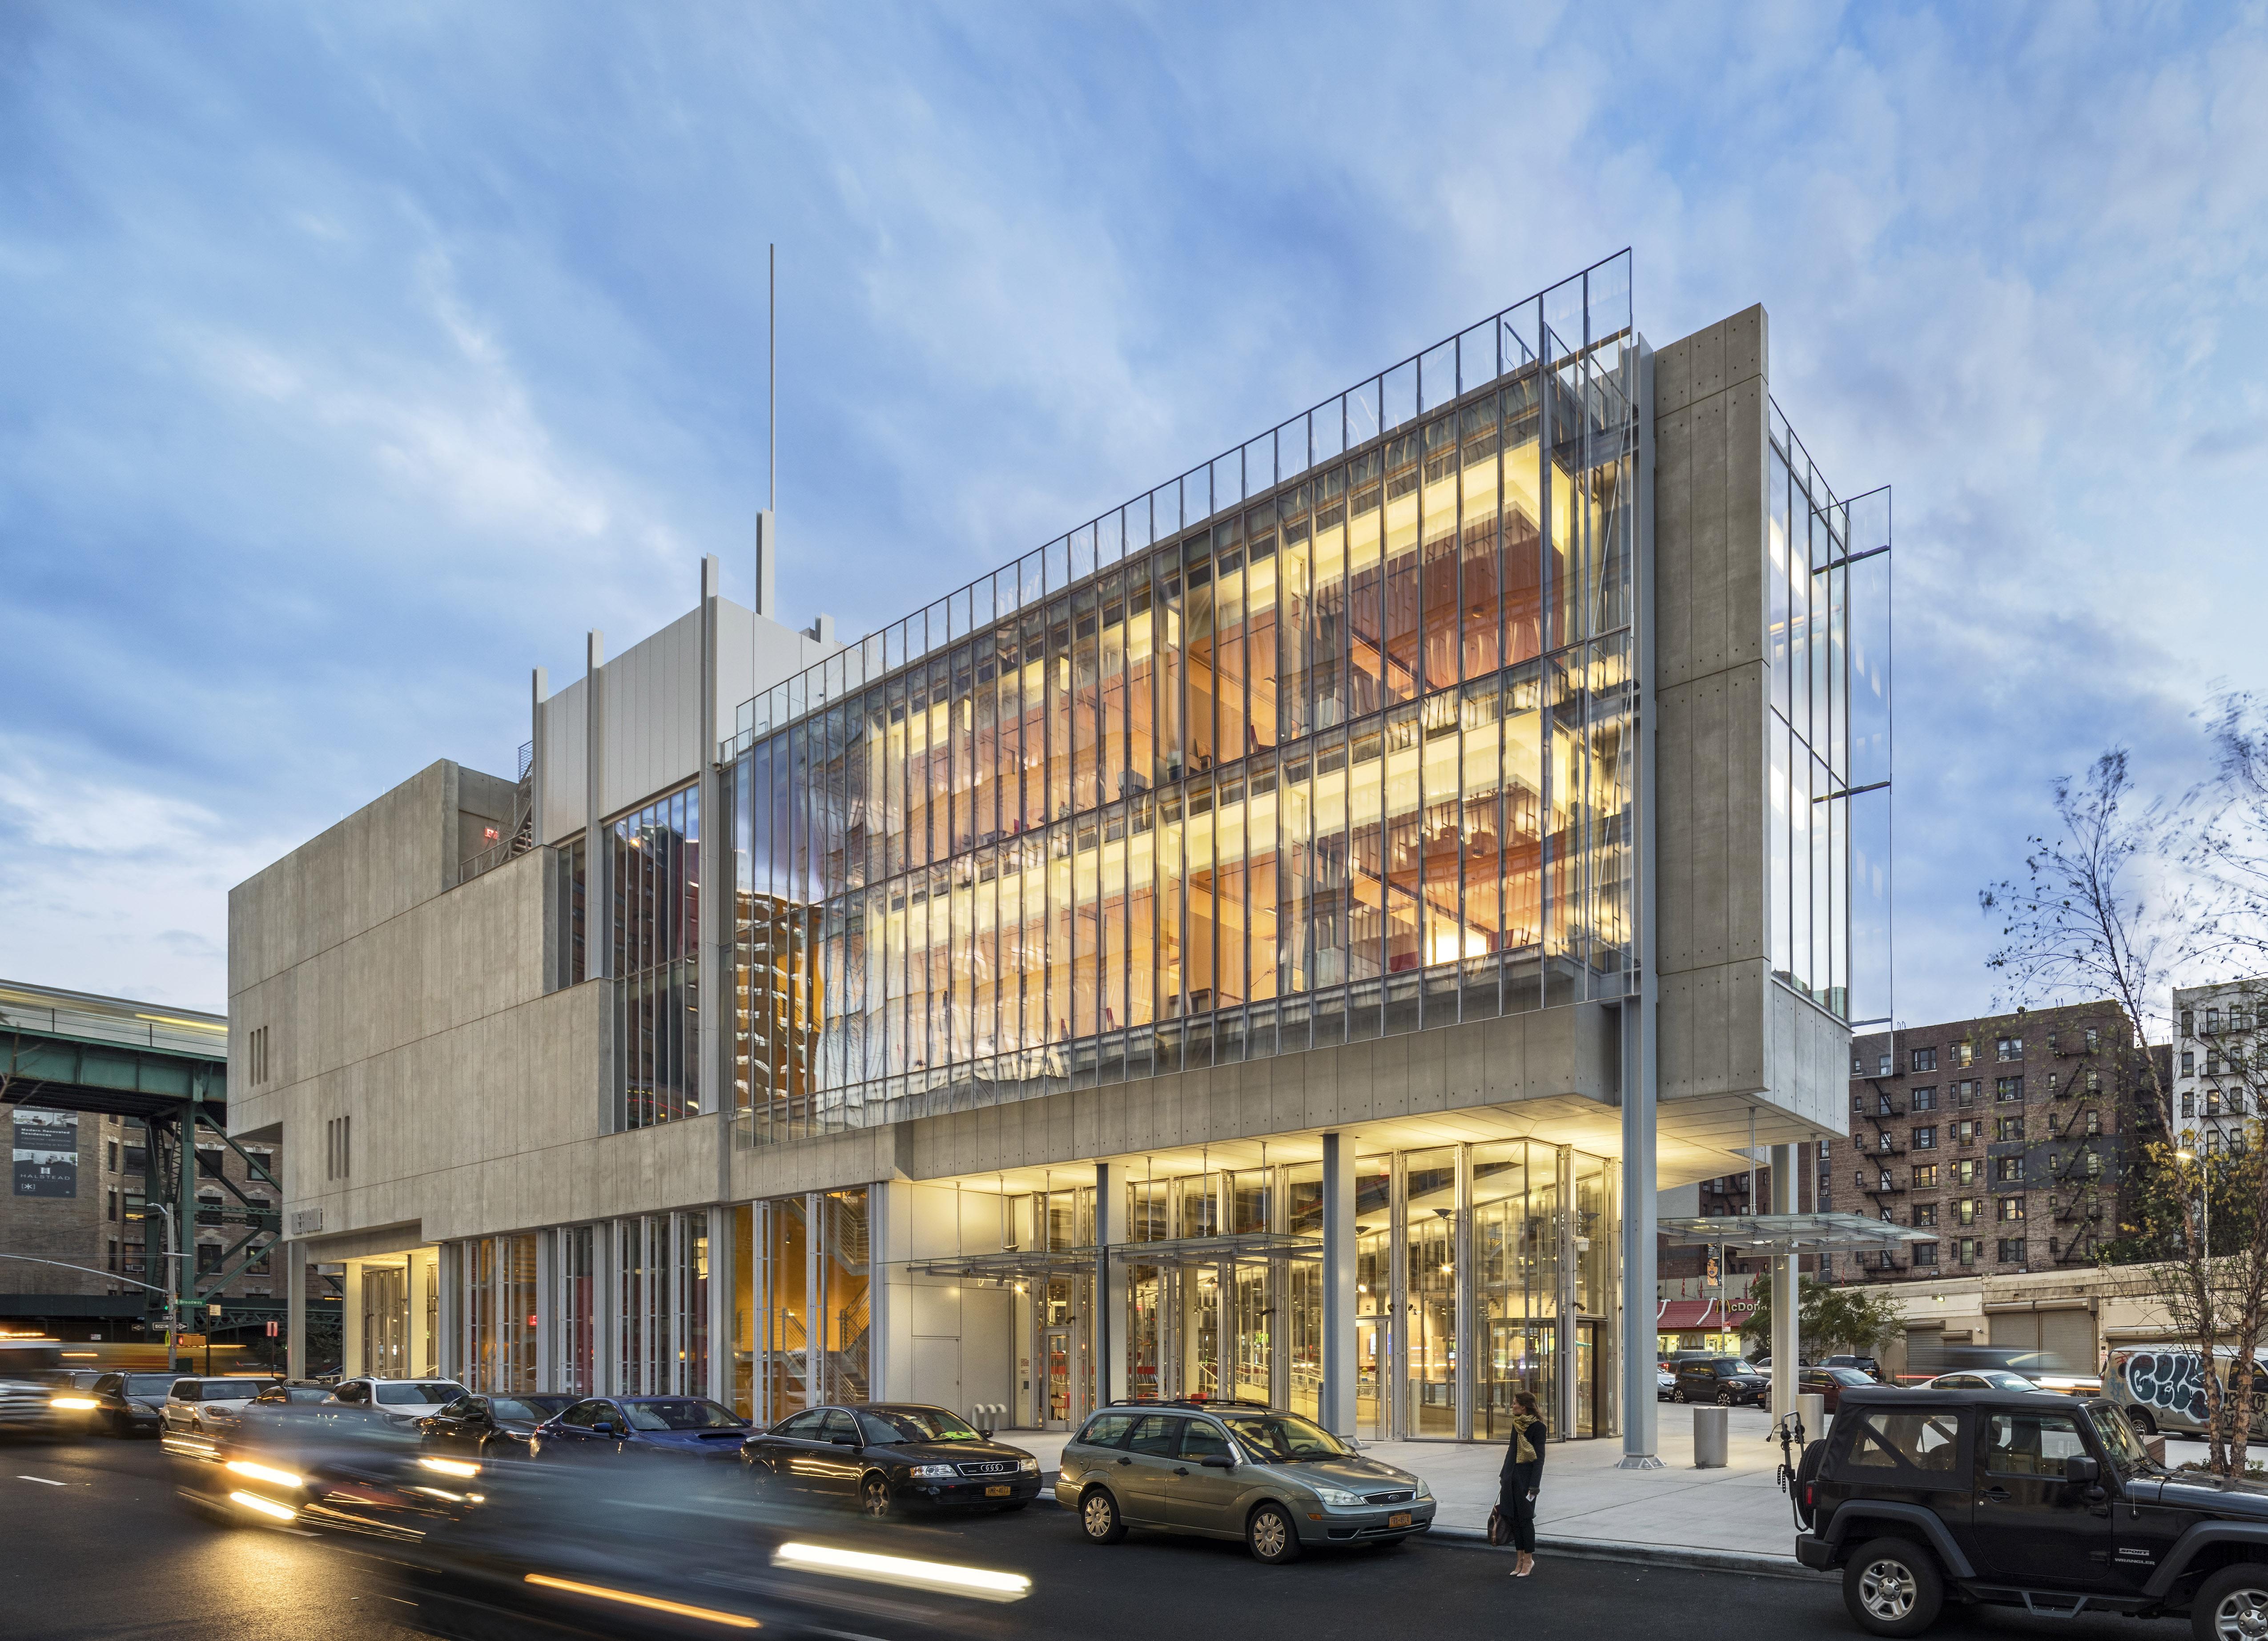 ULI New York Awards, Dattner Architects, The Forum at Columbia University